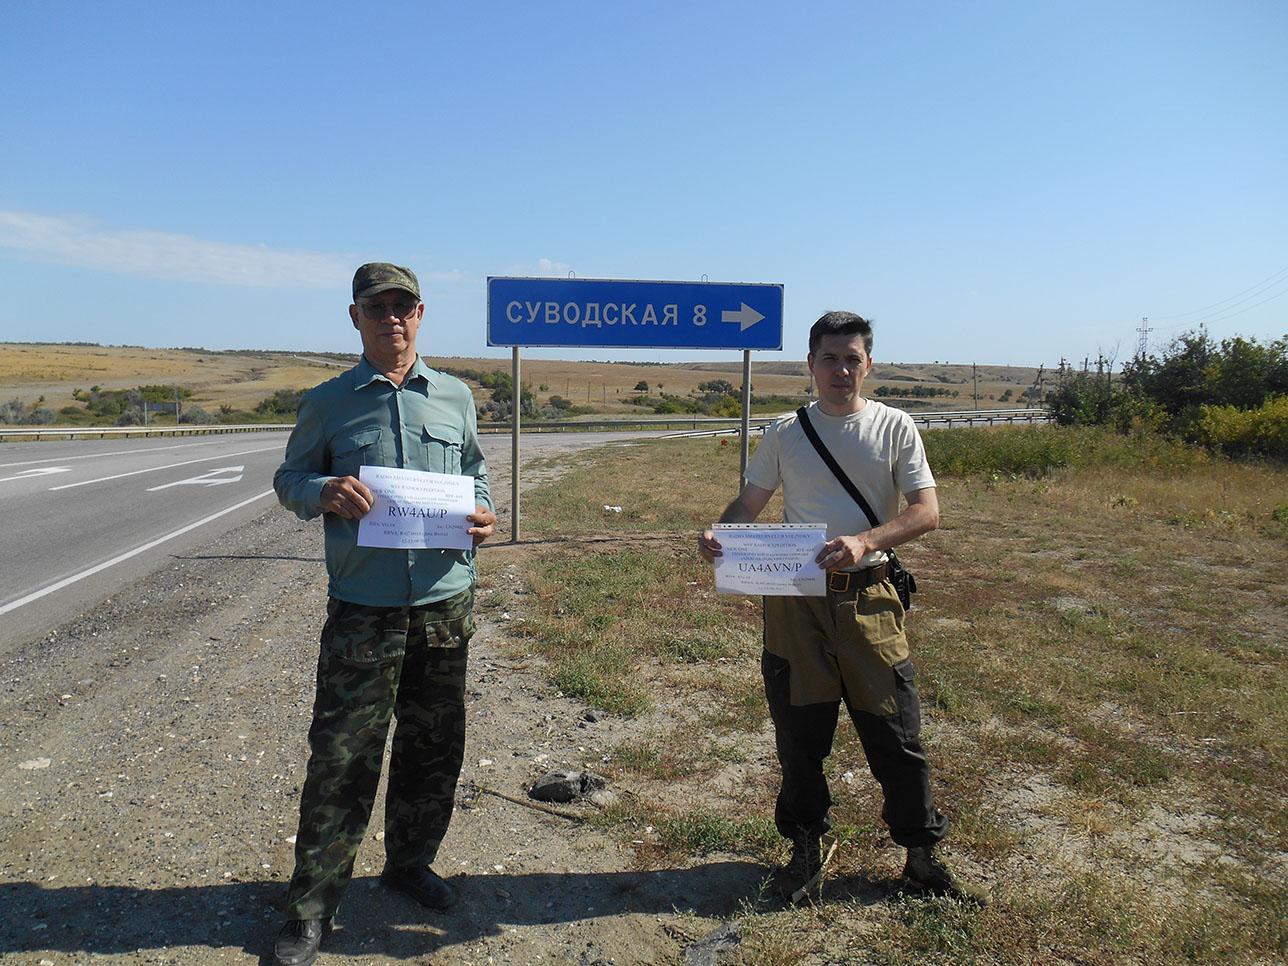 Почти у цели, 8 км. Слева RW4AU Геннадий, справа UA4AVN Олег.